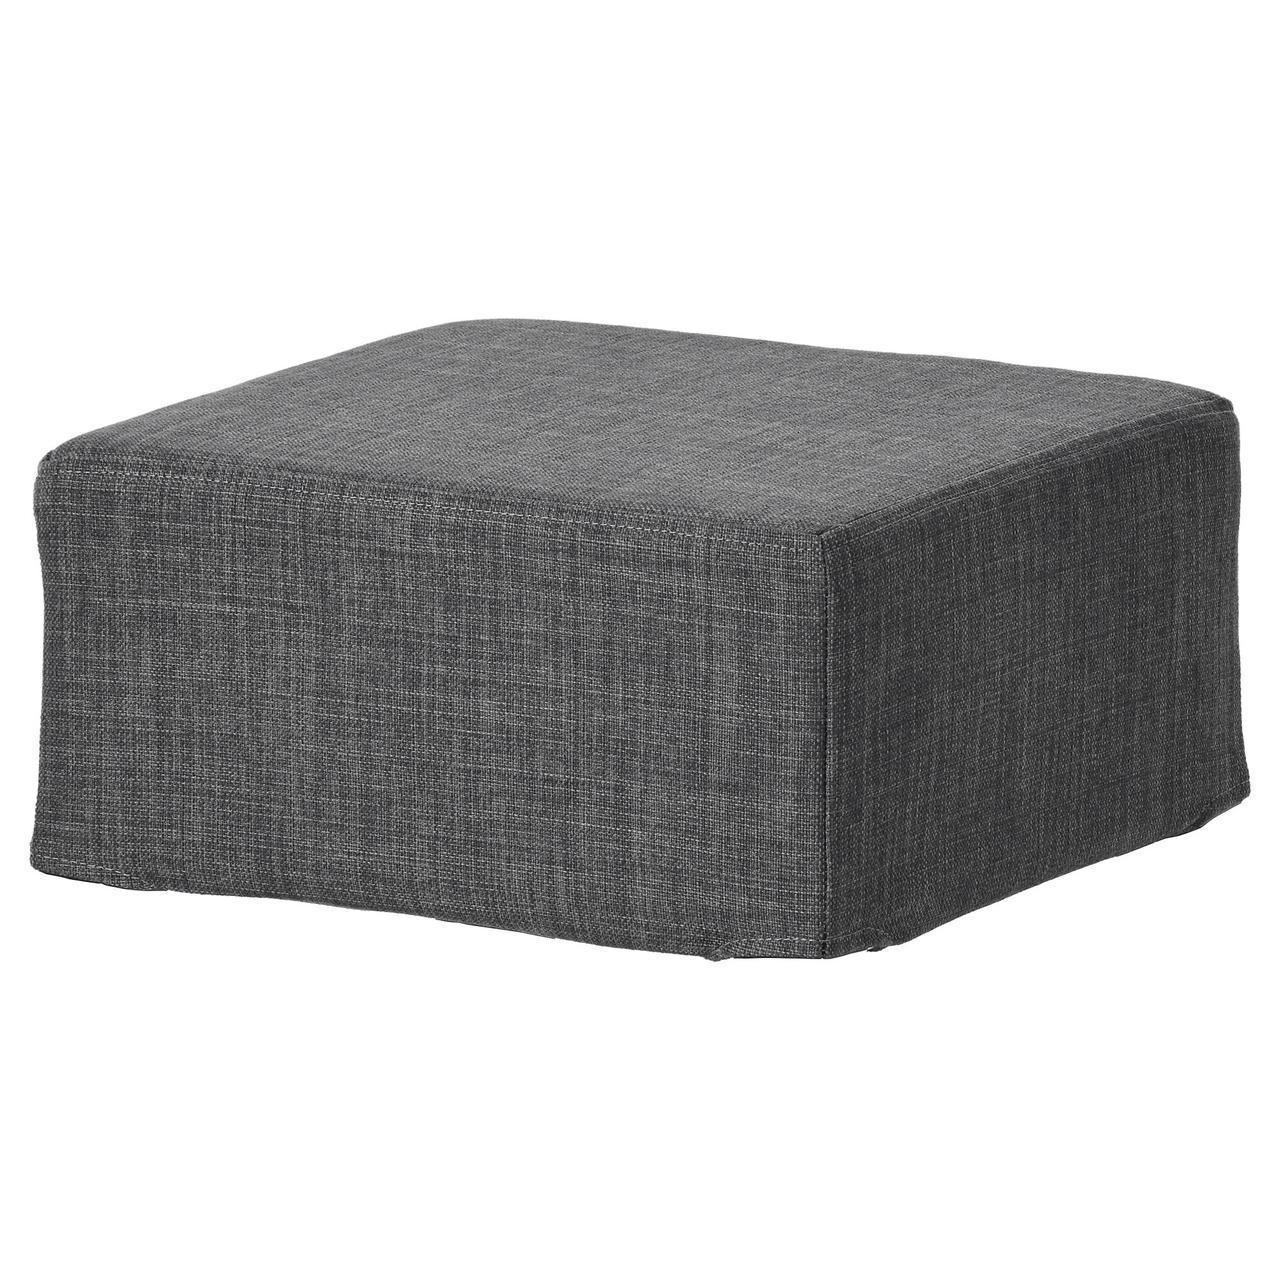 IKEA NILS Чехол для табурета, Шифтебу темно-серый  (302.932.90)